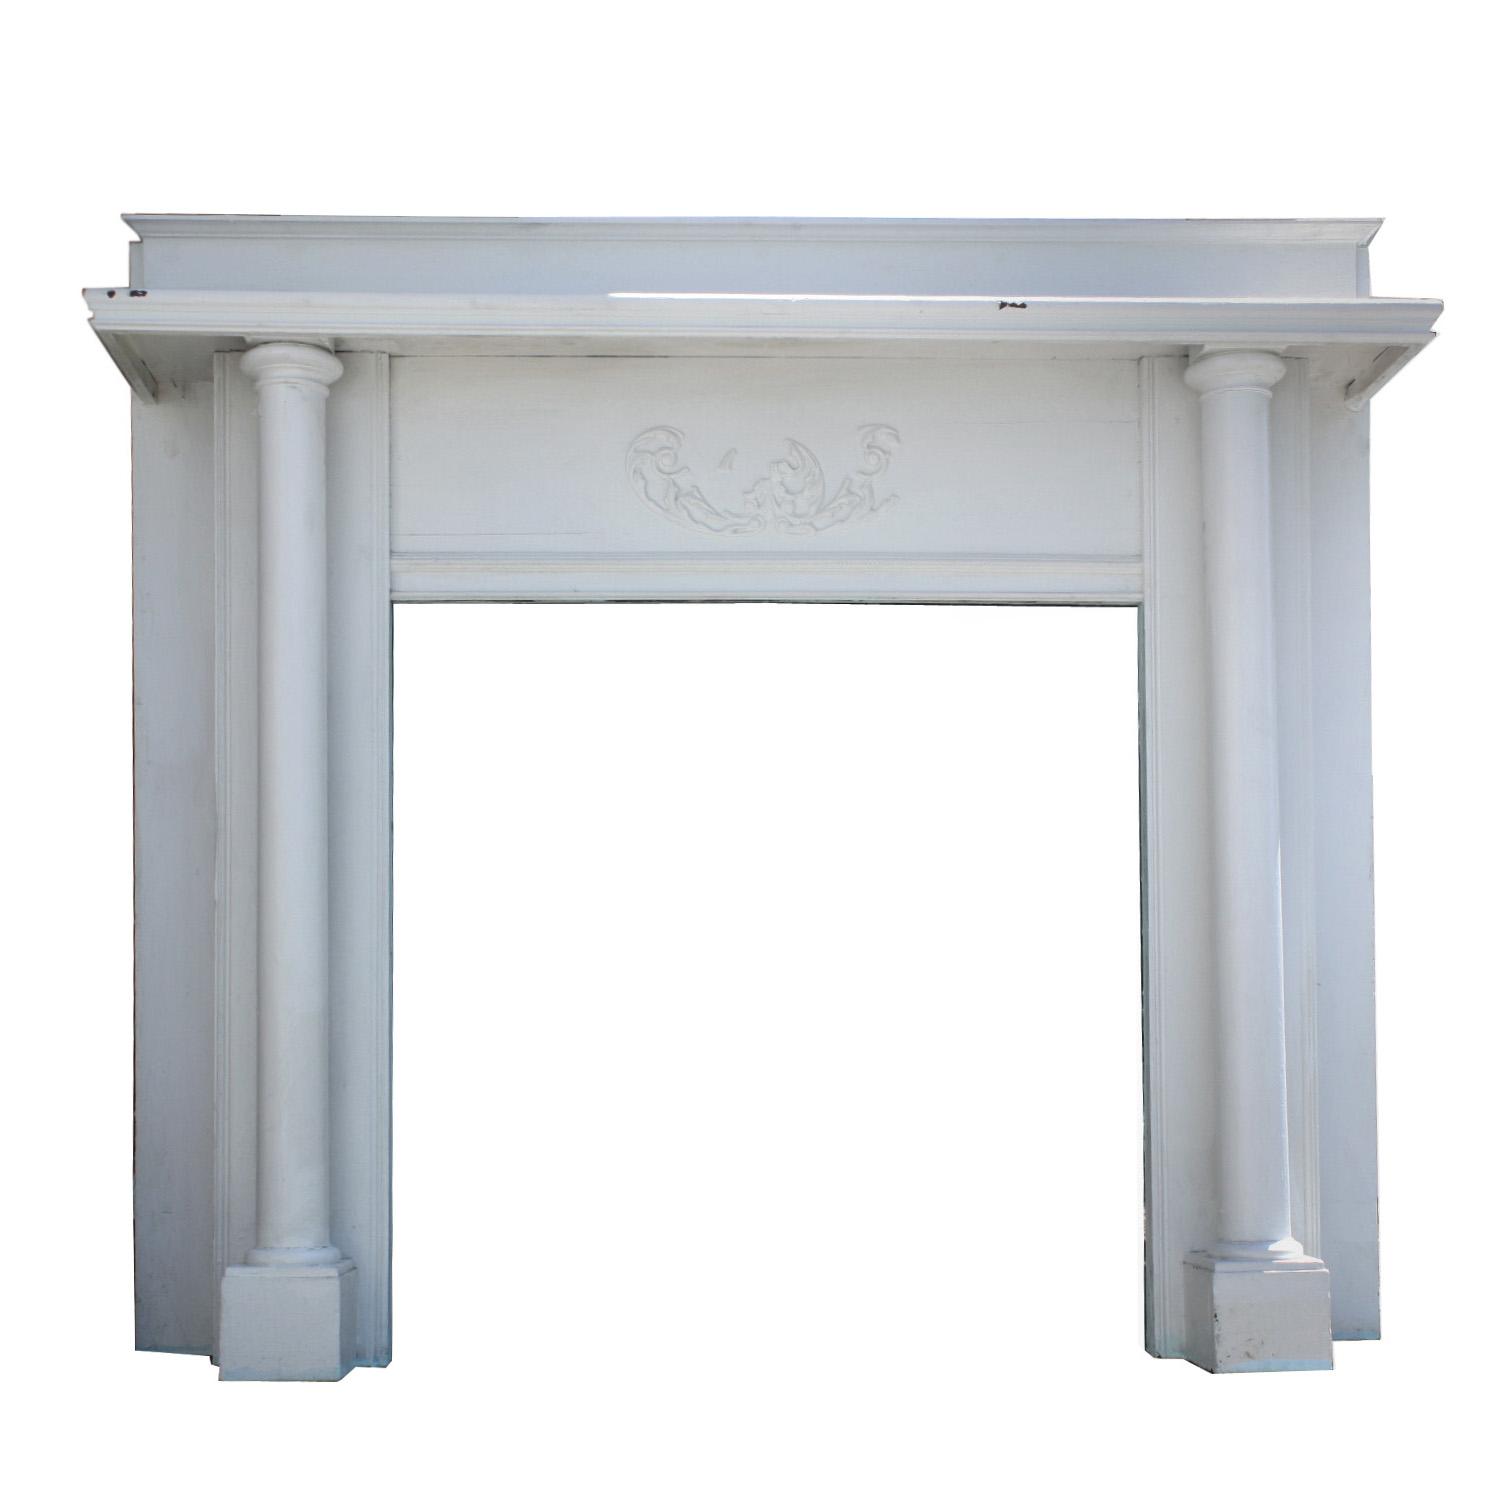 Elegant Antique Fireplace Mantel C 1900 Nfpm72 Rw For Sale Classifieds